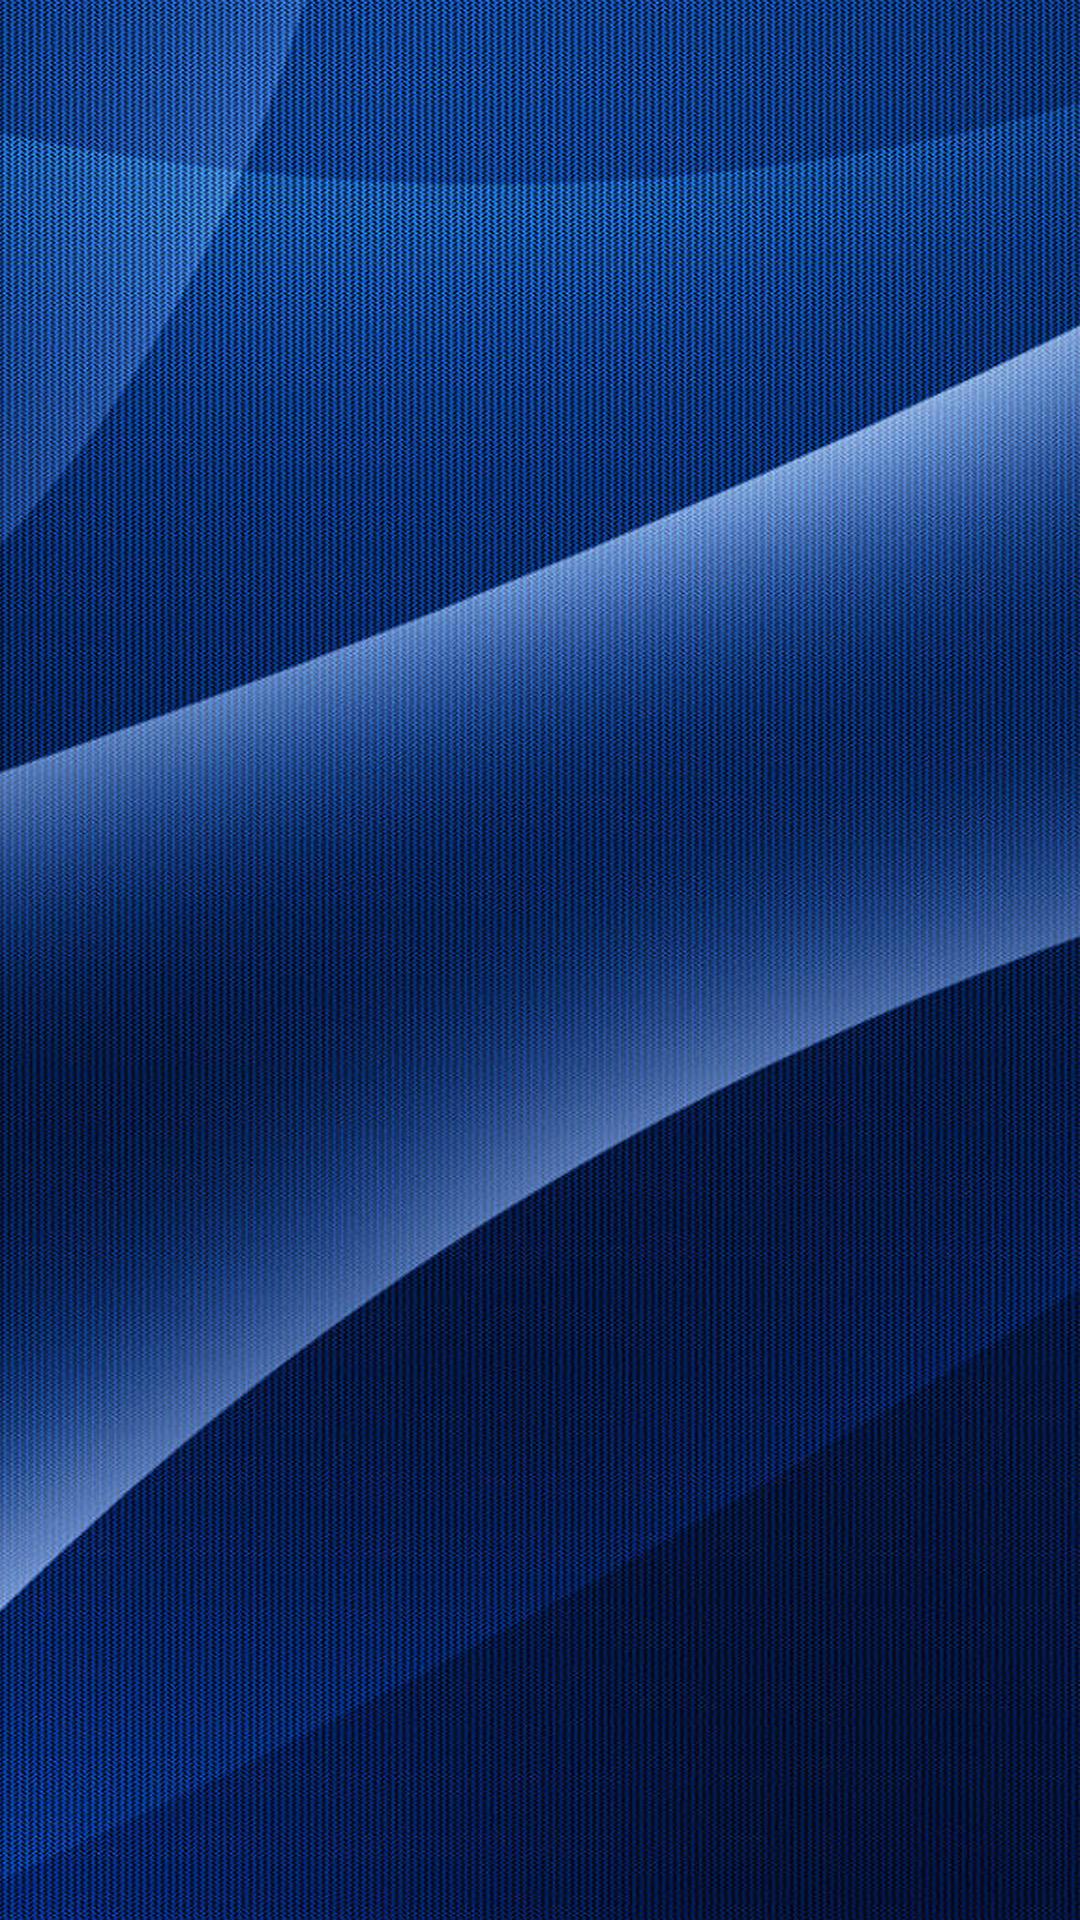 Samsung Galaxy S5 Wallpaper: Wallpaper For Samsung Galaxy S5